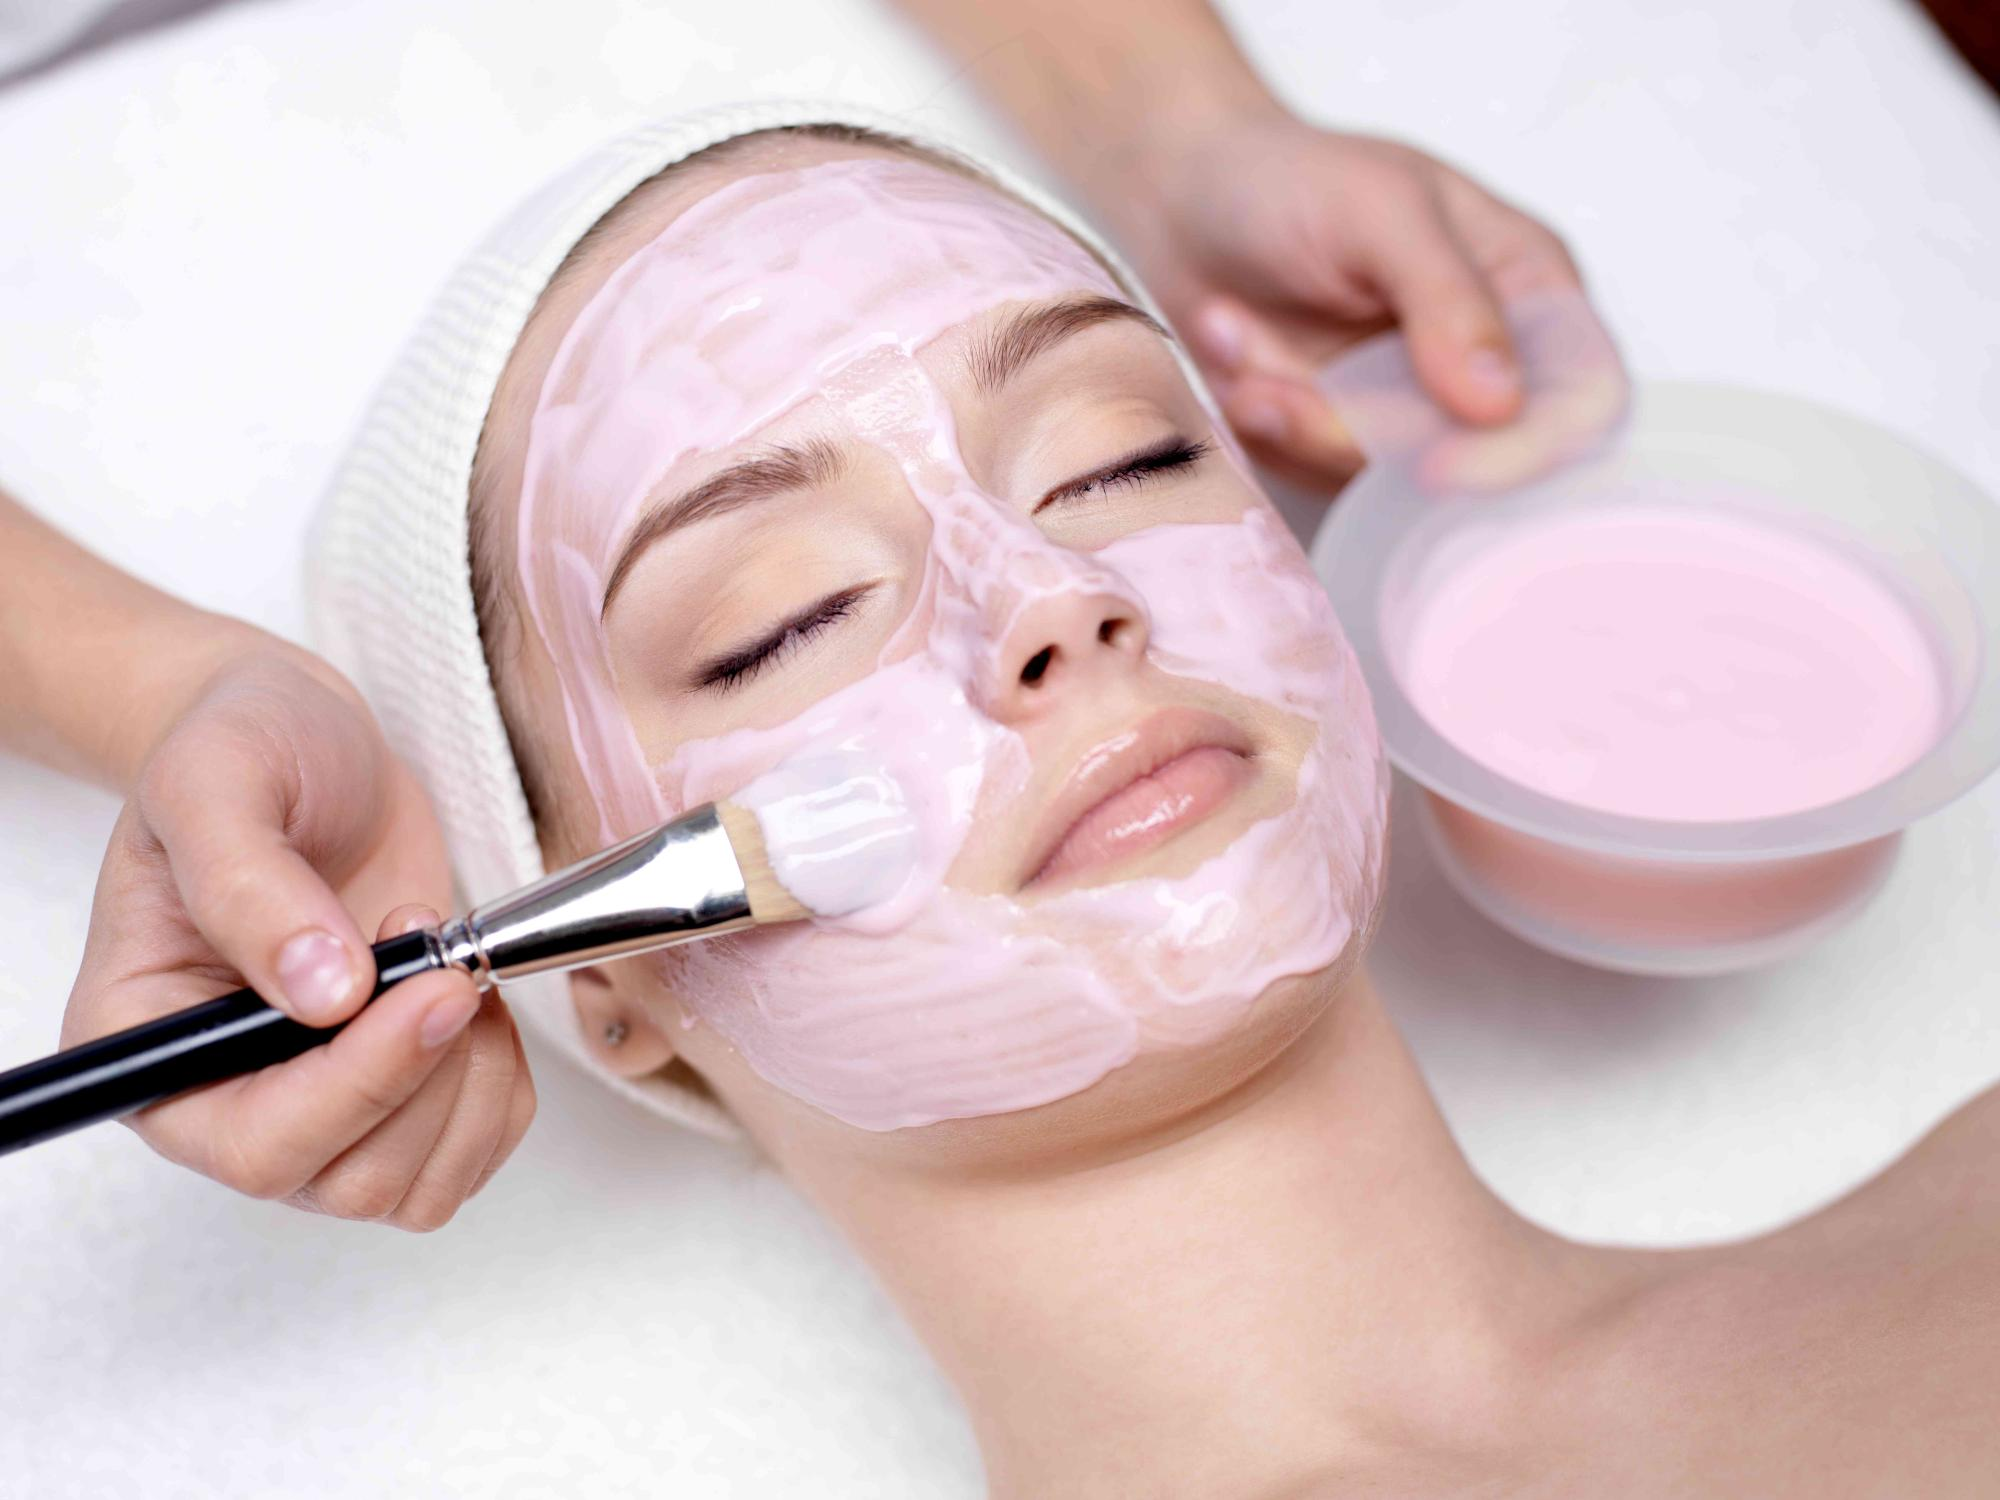 bigstock-Girl-Receiving-Cosmetic-Pink-F-16051799-c-r.jpg